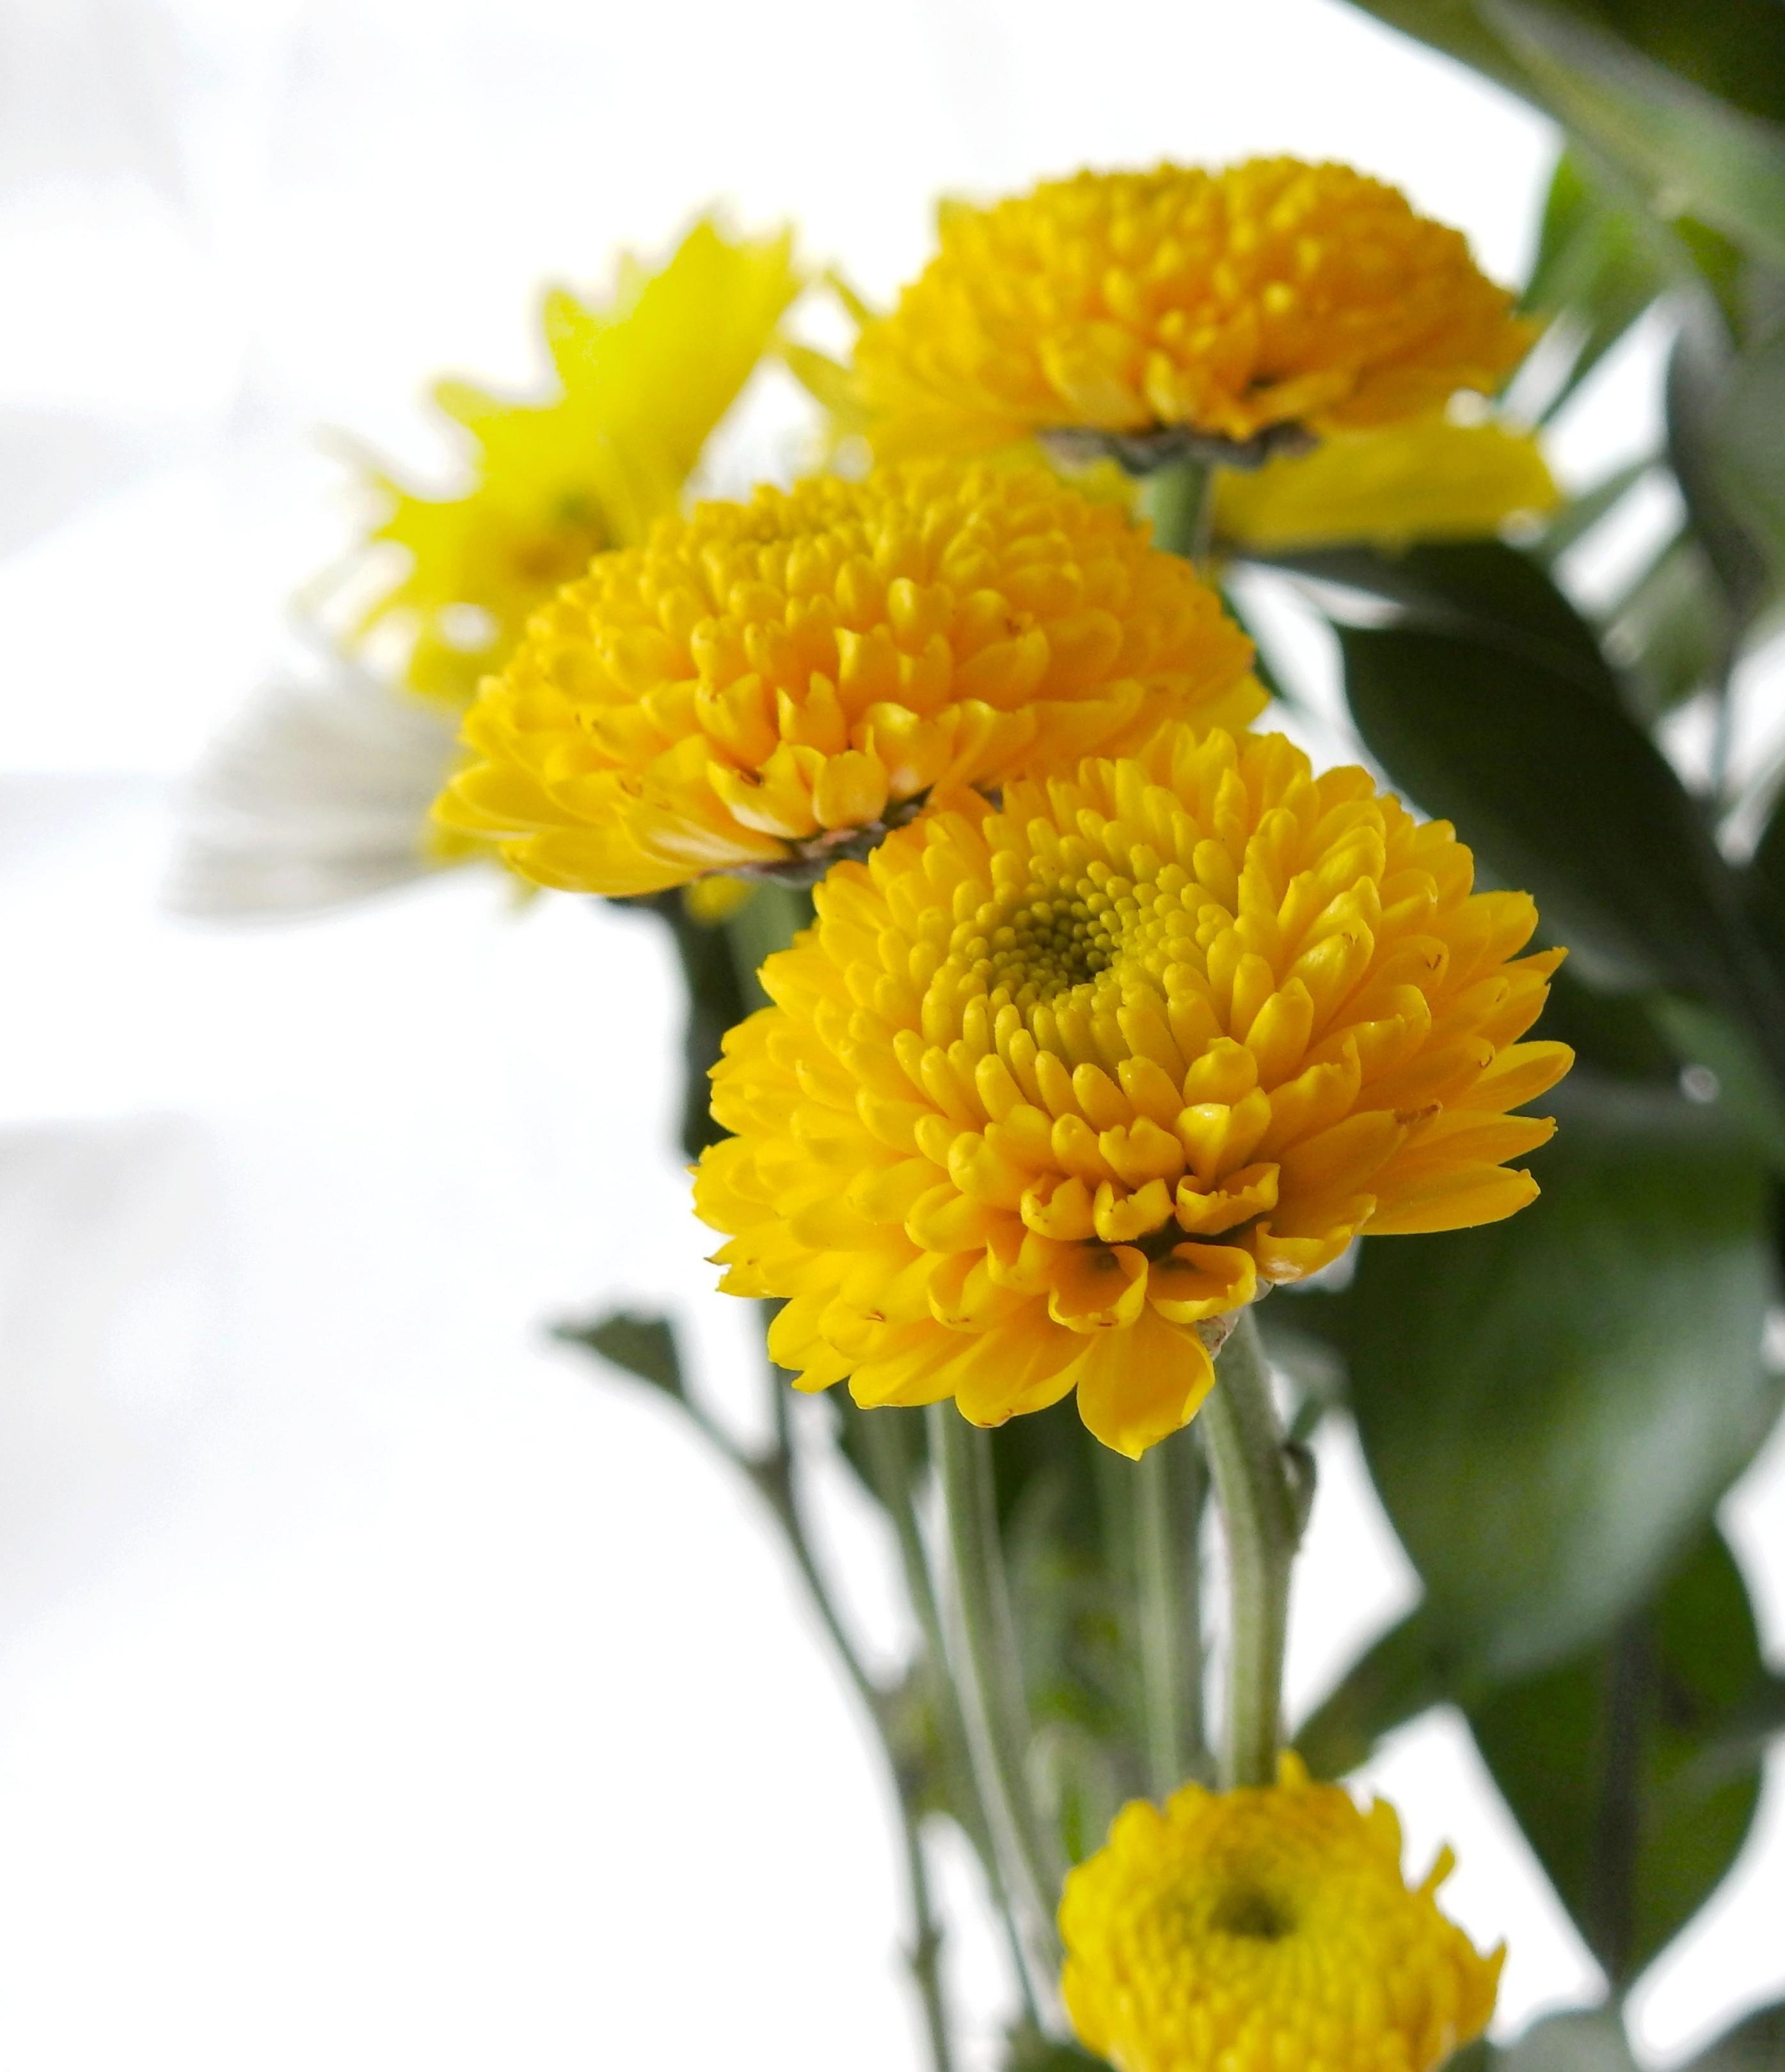 [Fil Ouvert] Fleurs - Page 21 R2018-10